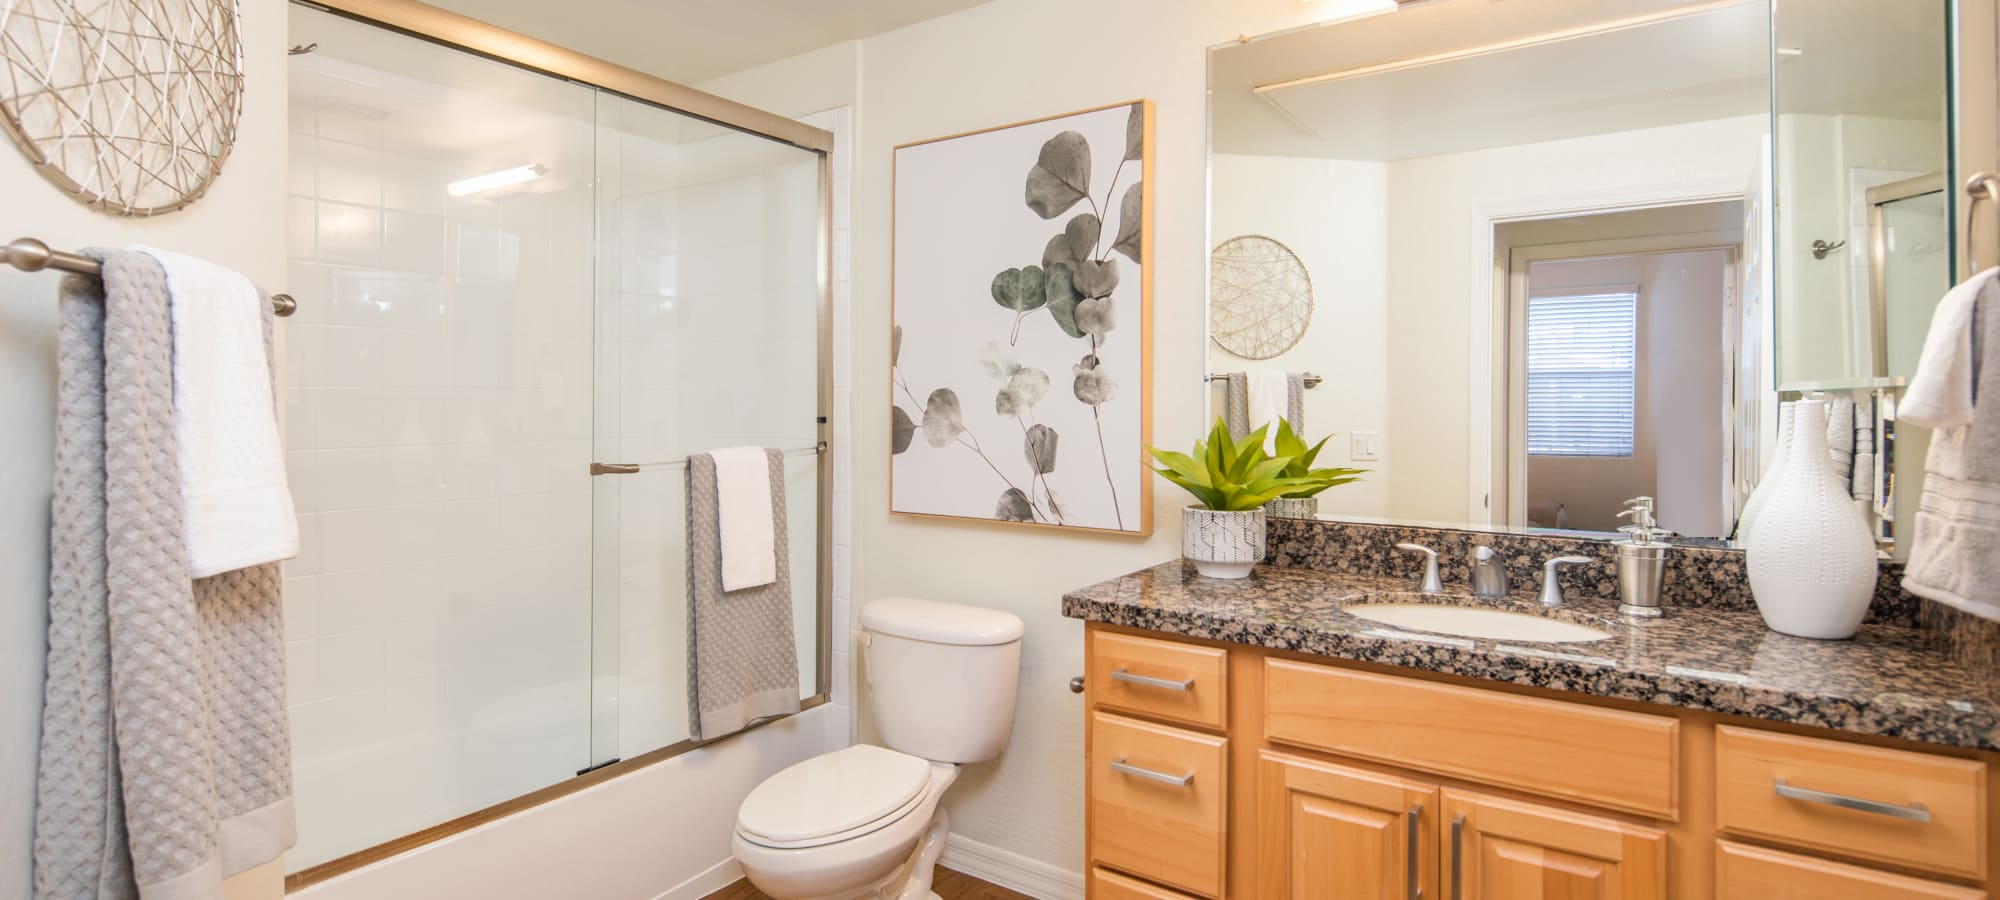 Bathroom layout at The Fleetwood in Tempe, Arizona